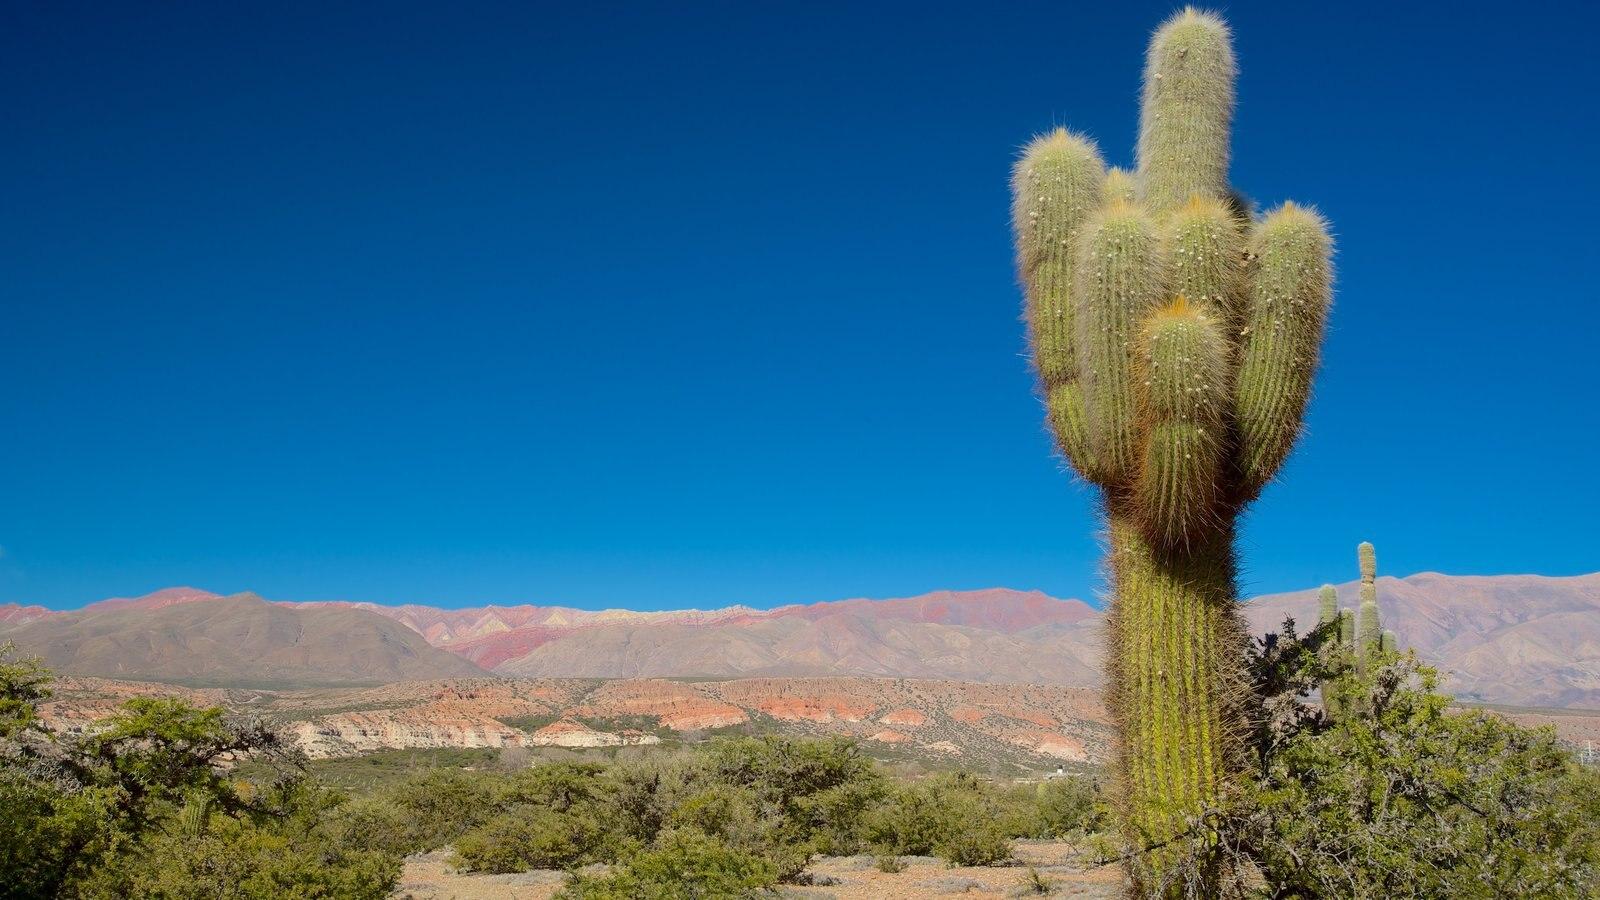 Jujuy caracterizando paisagens do deserto